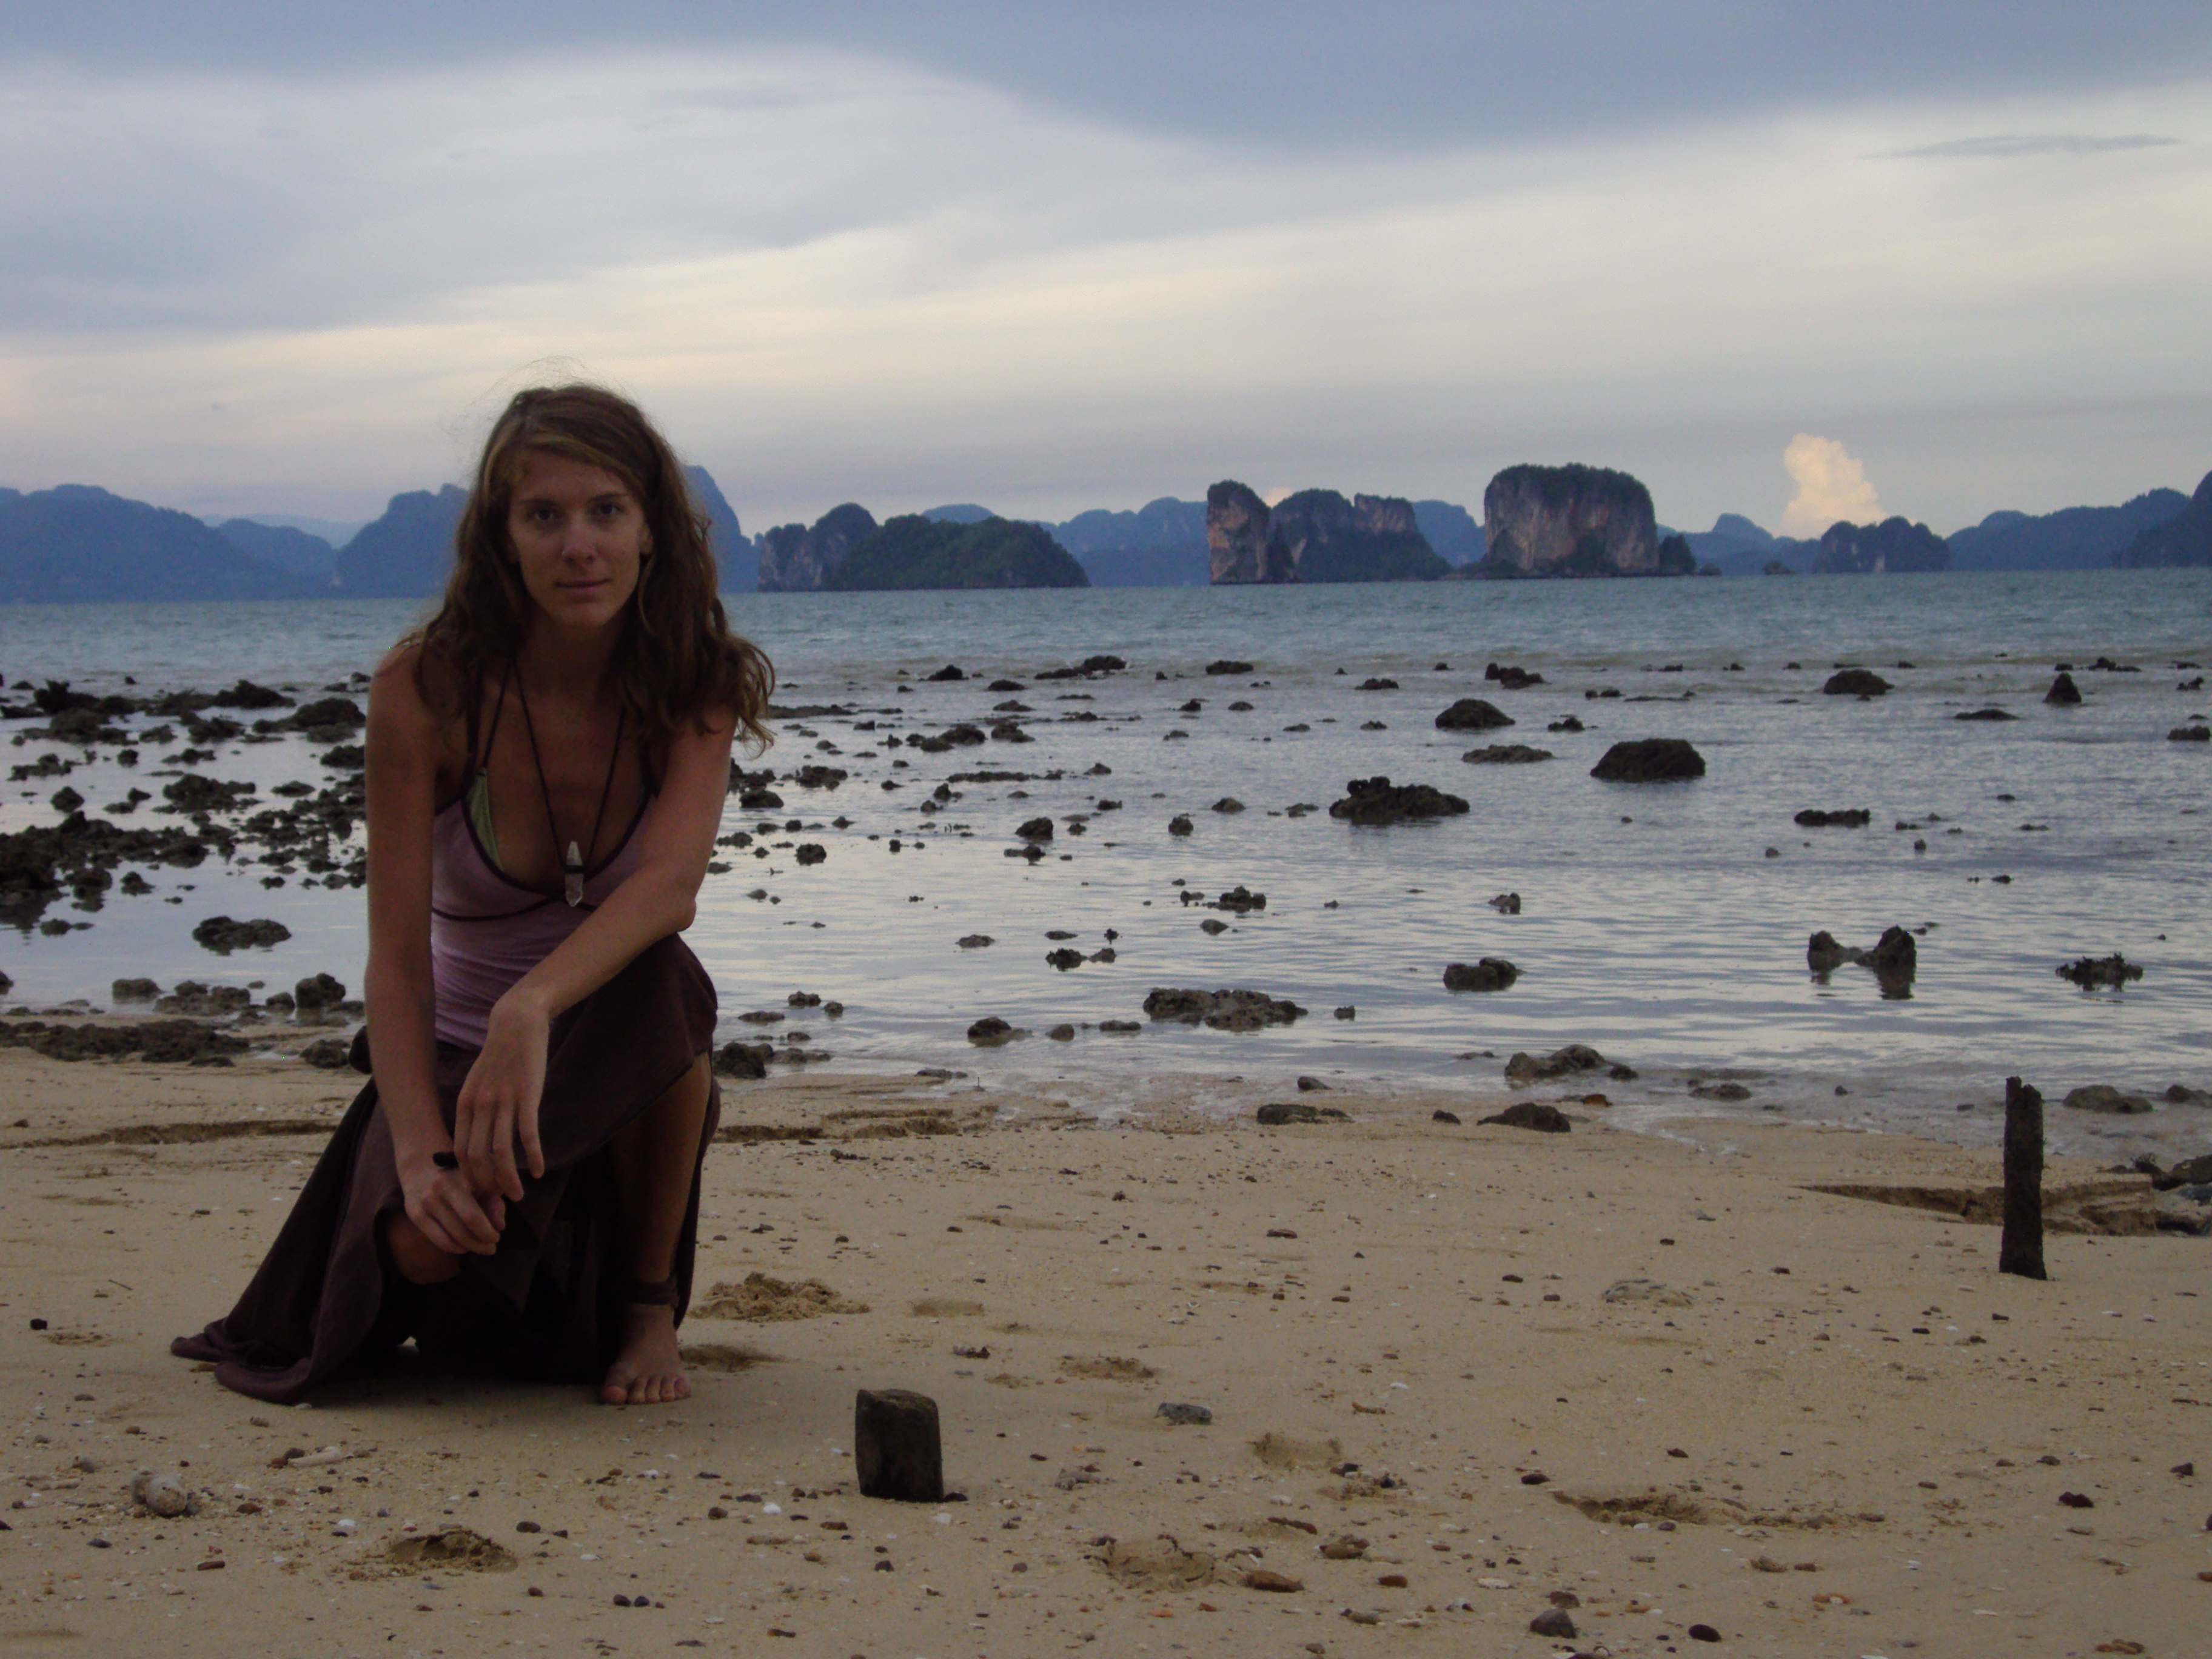 A world away on the Andaman Coast of Thailand. Photo provided